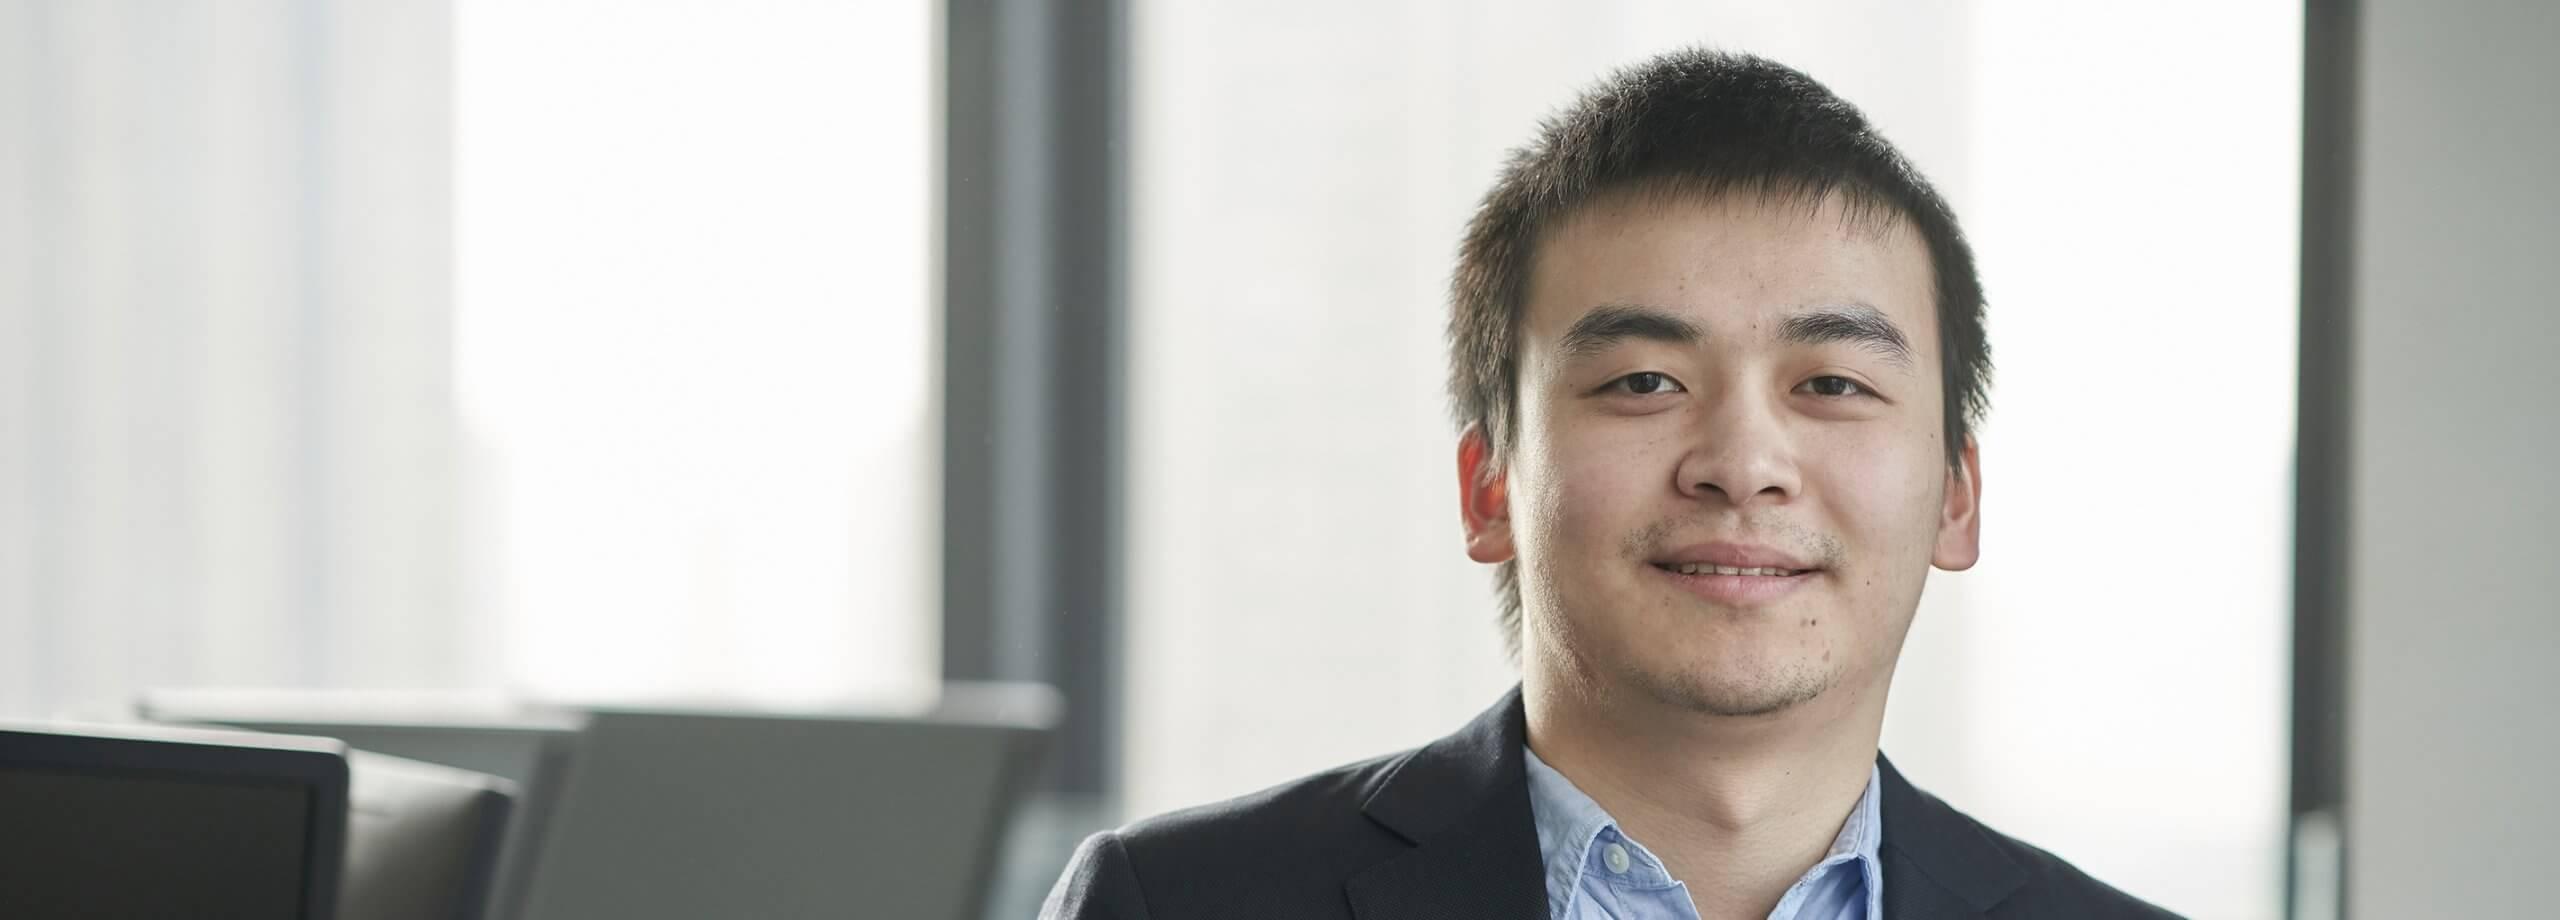 Portrait of Chao Jiang